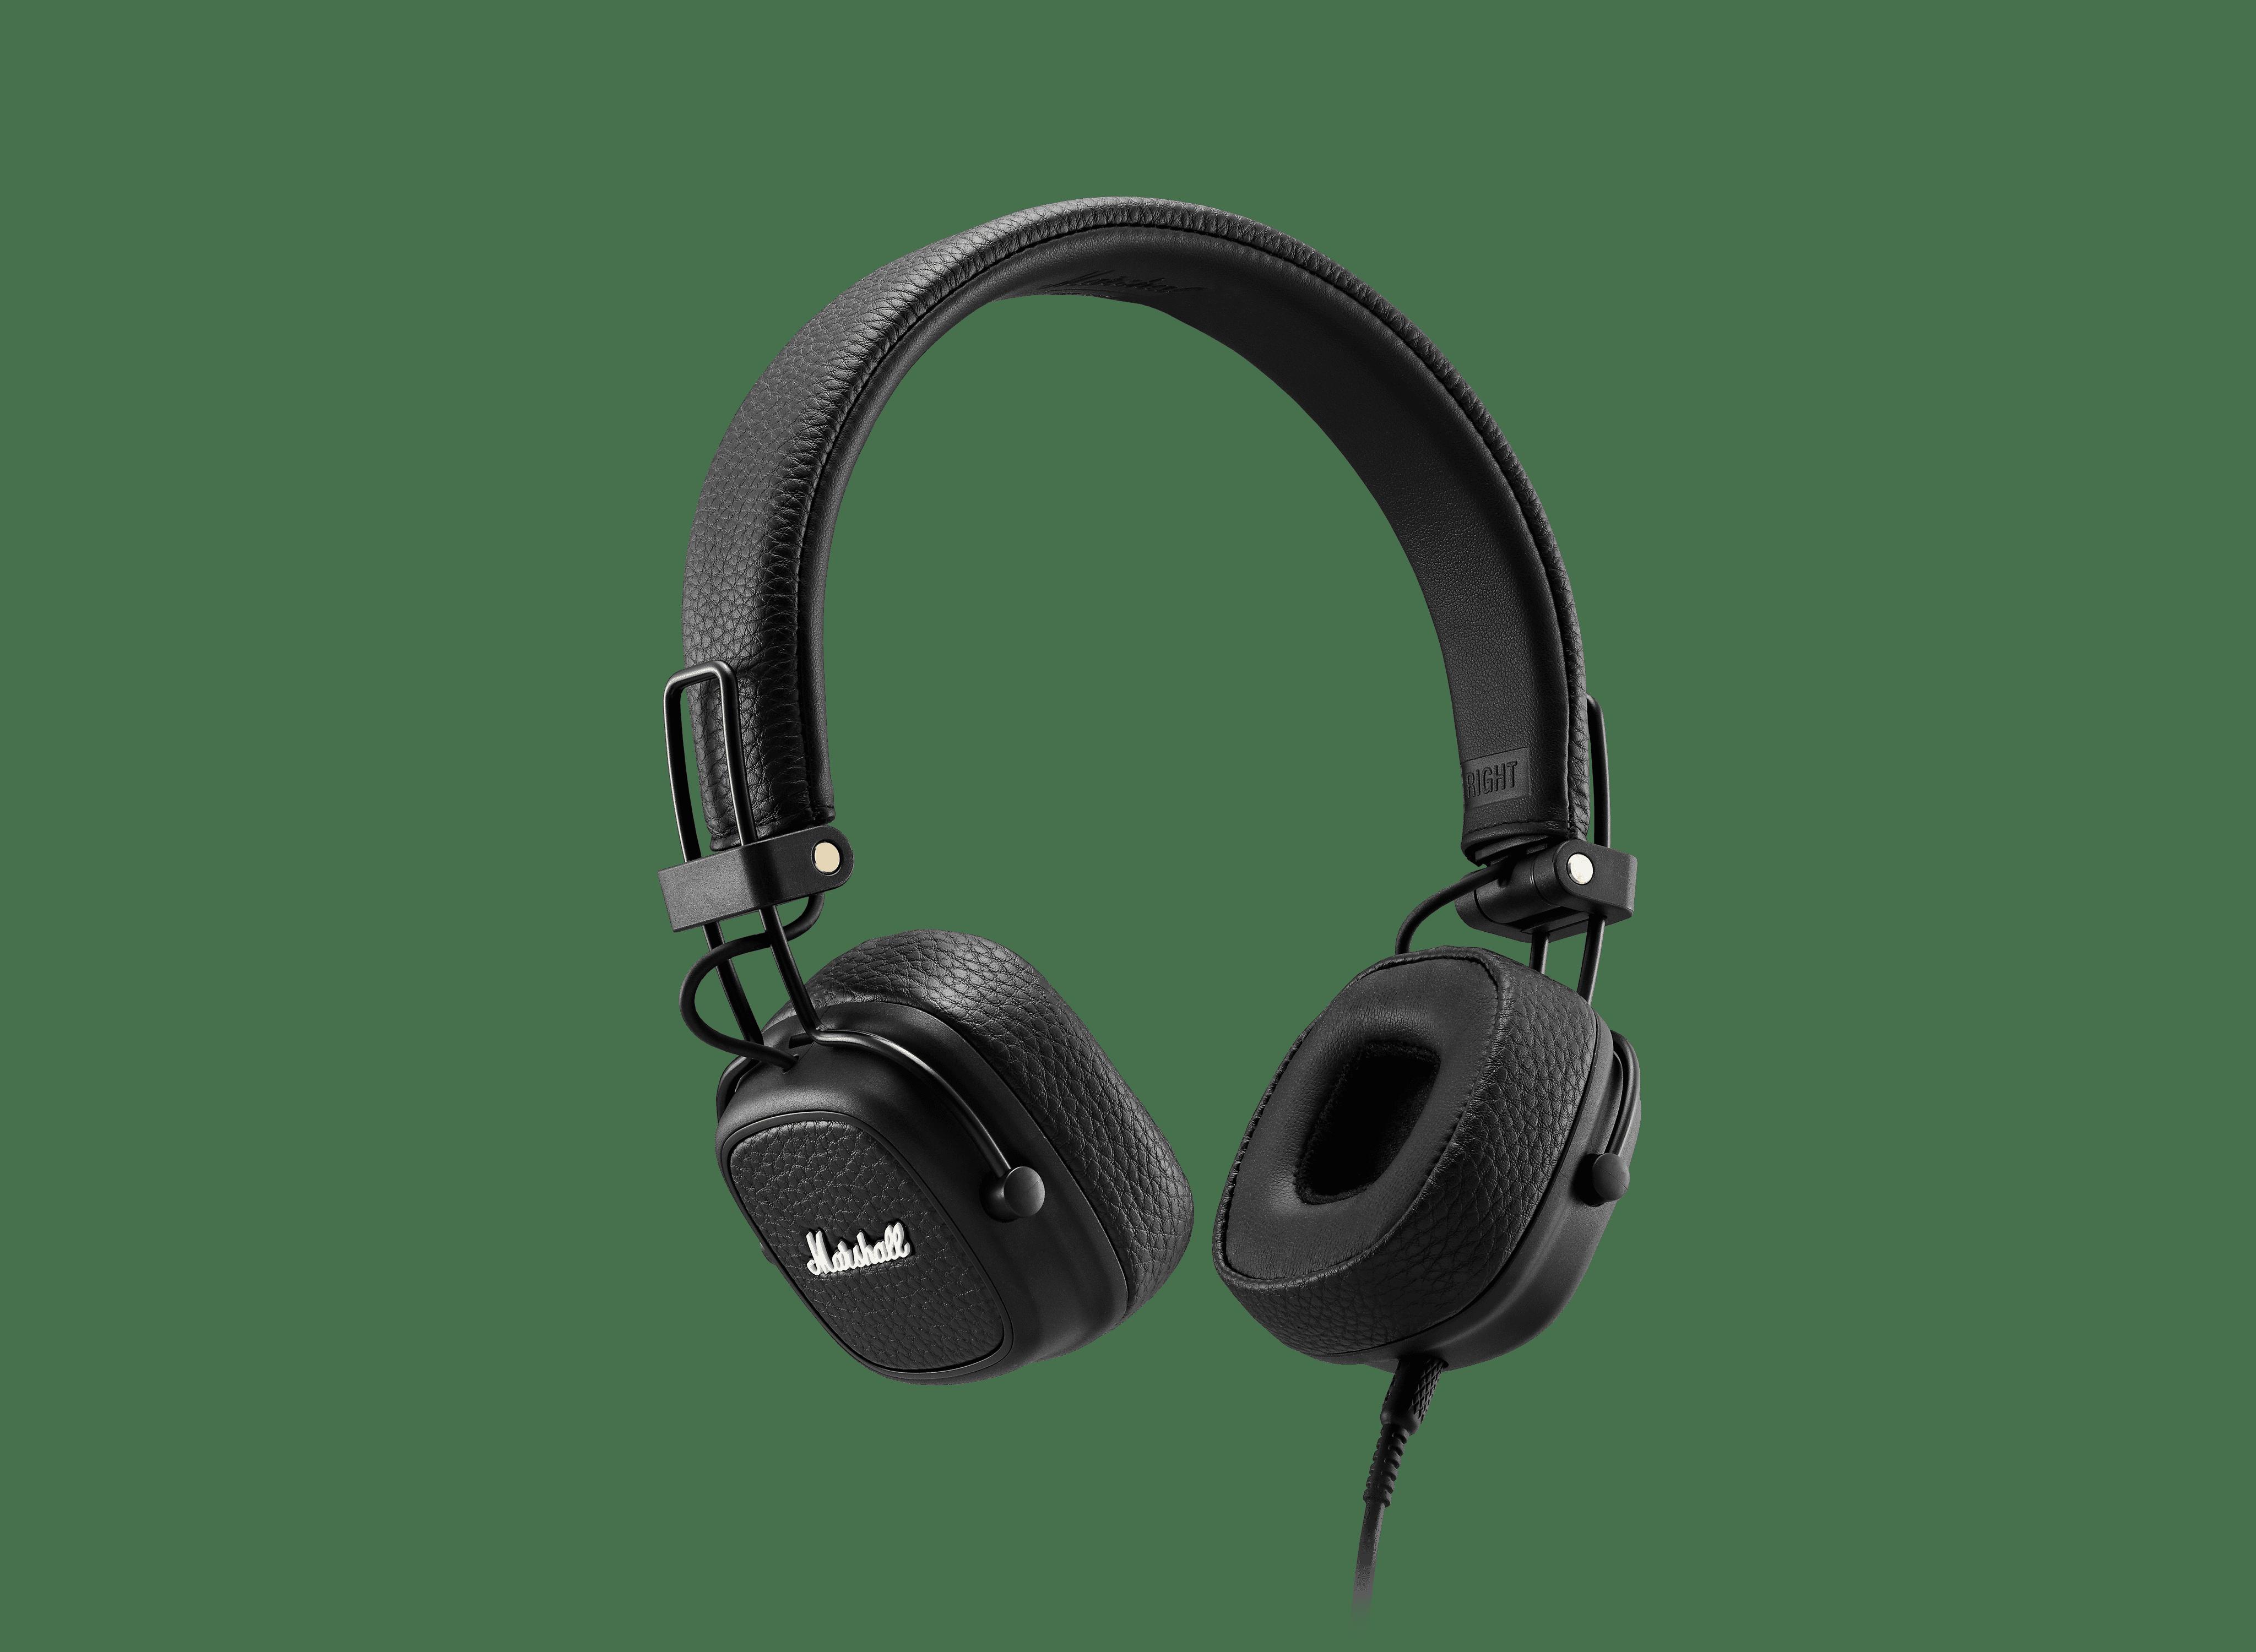 Marshall Major III Wired On-Ear Headphones with Mic